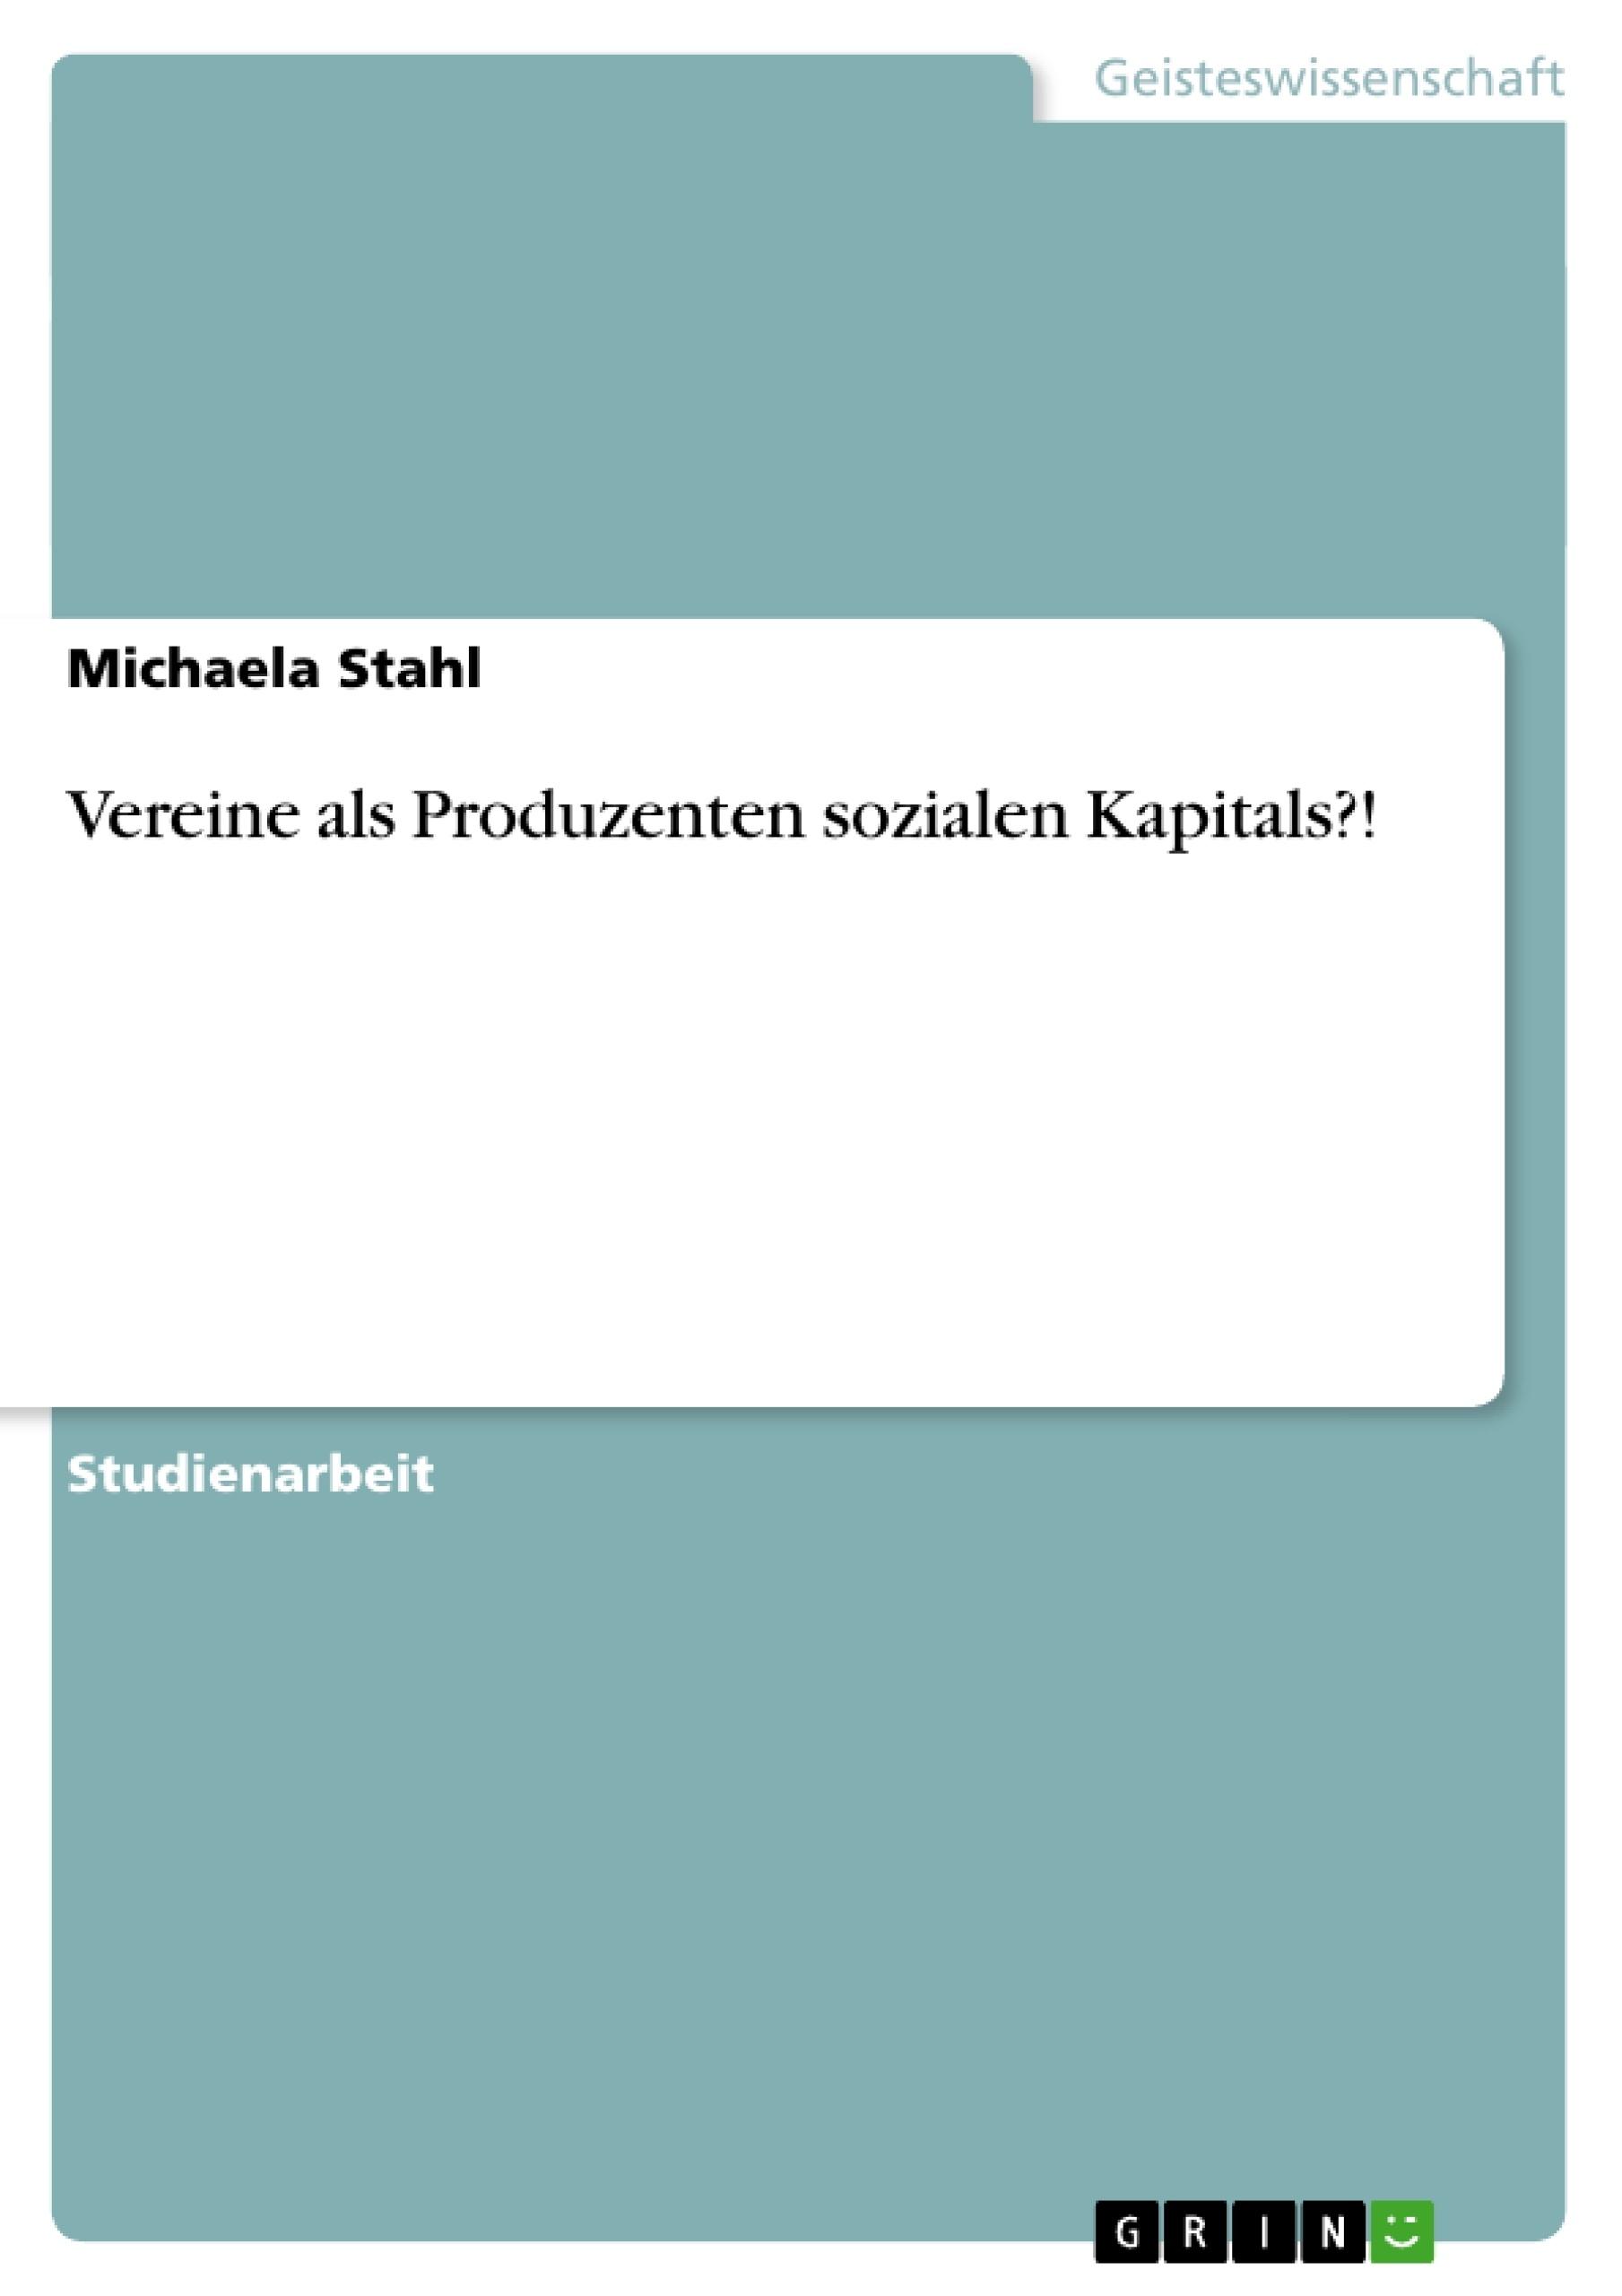 Titel: Vereine als Produzenten sozialen Kapitals?!